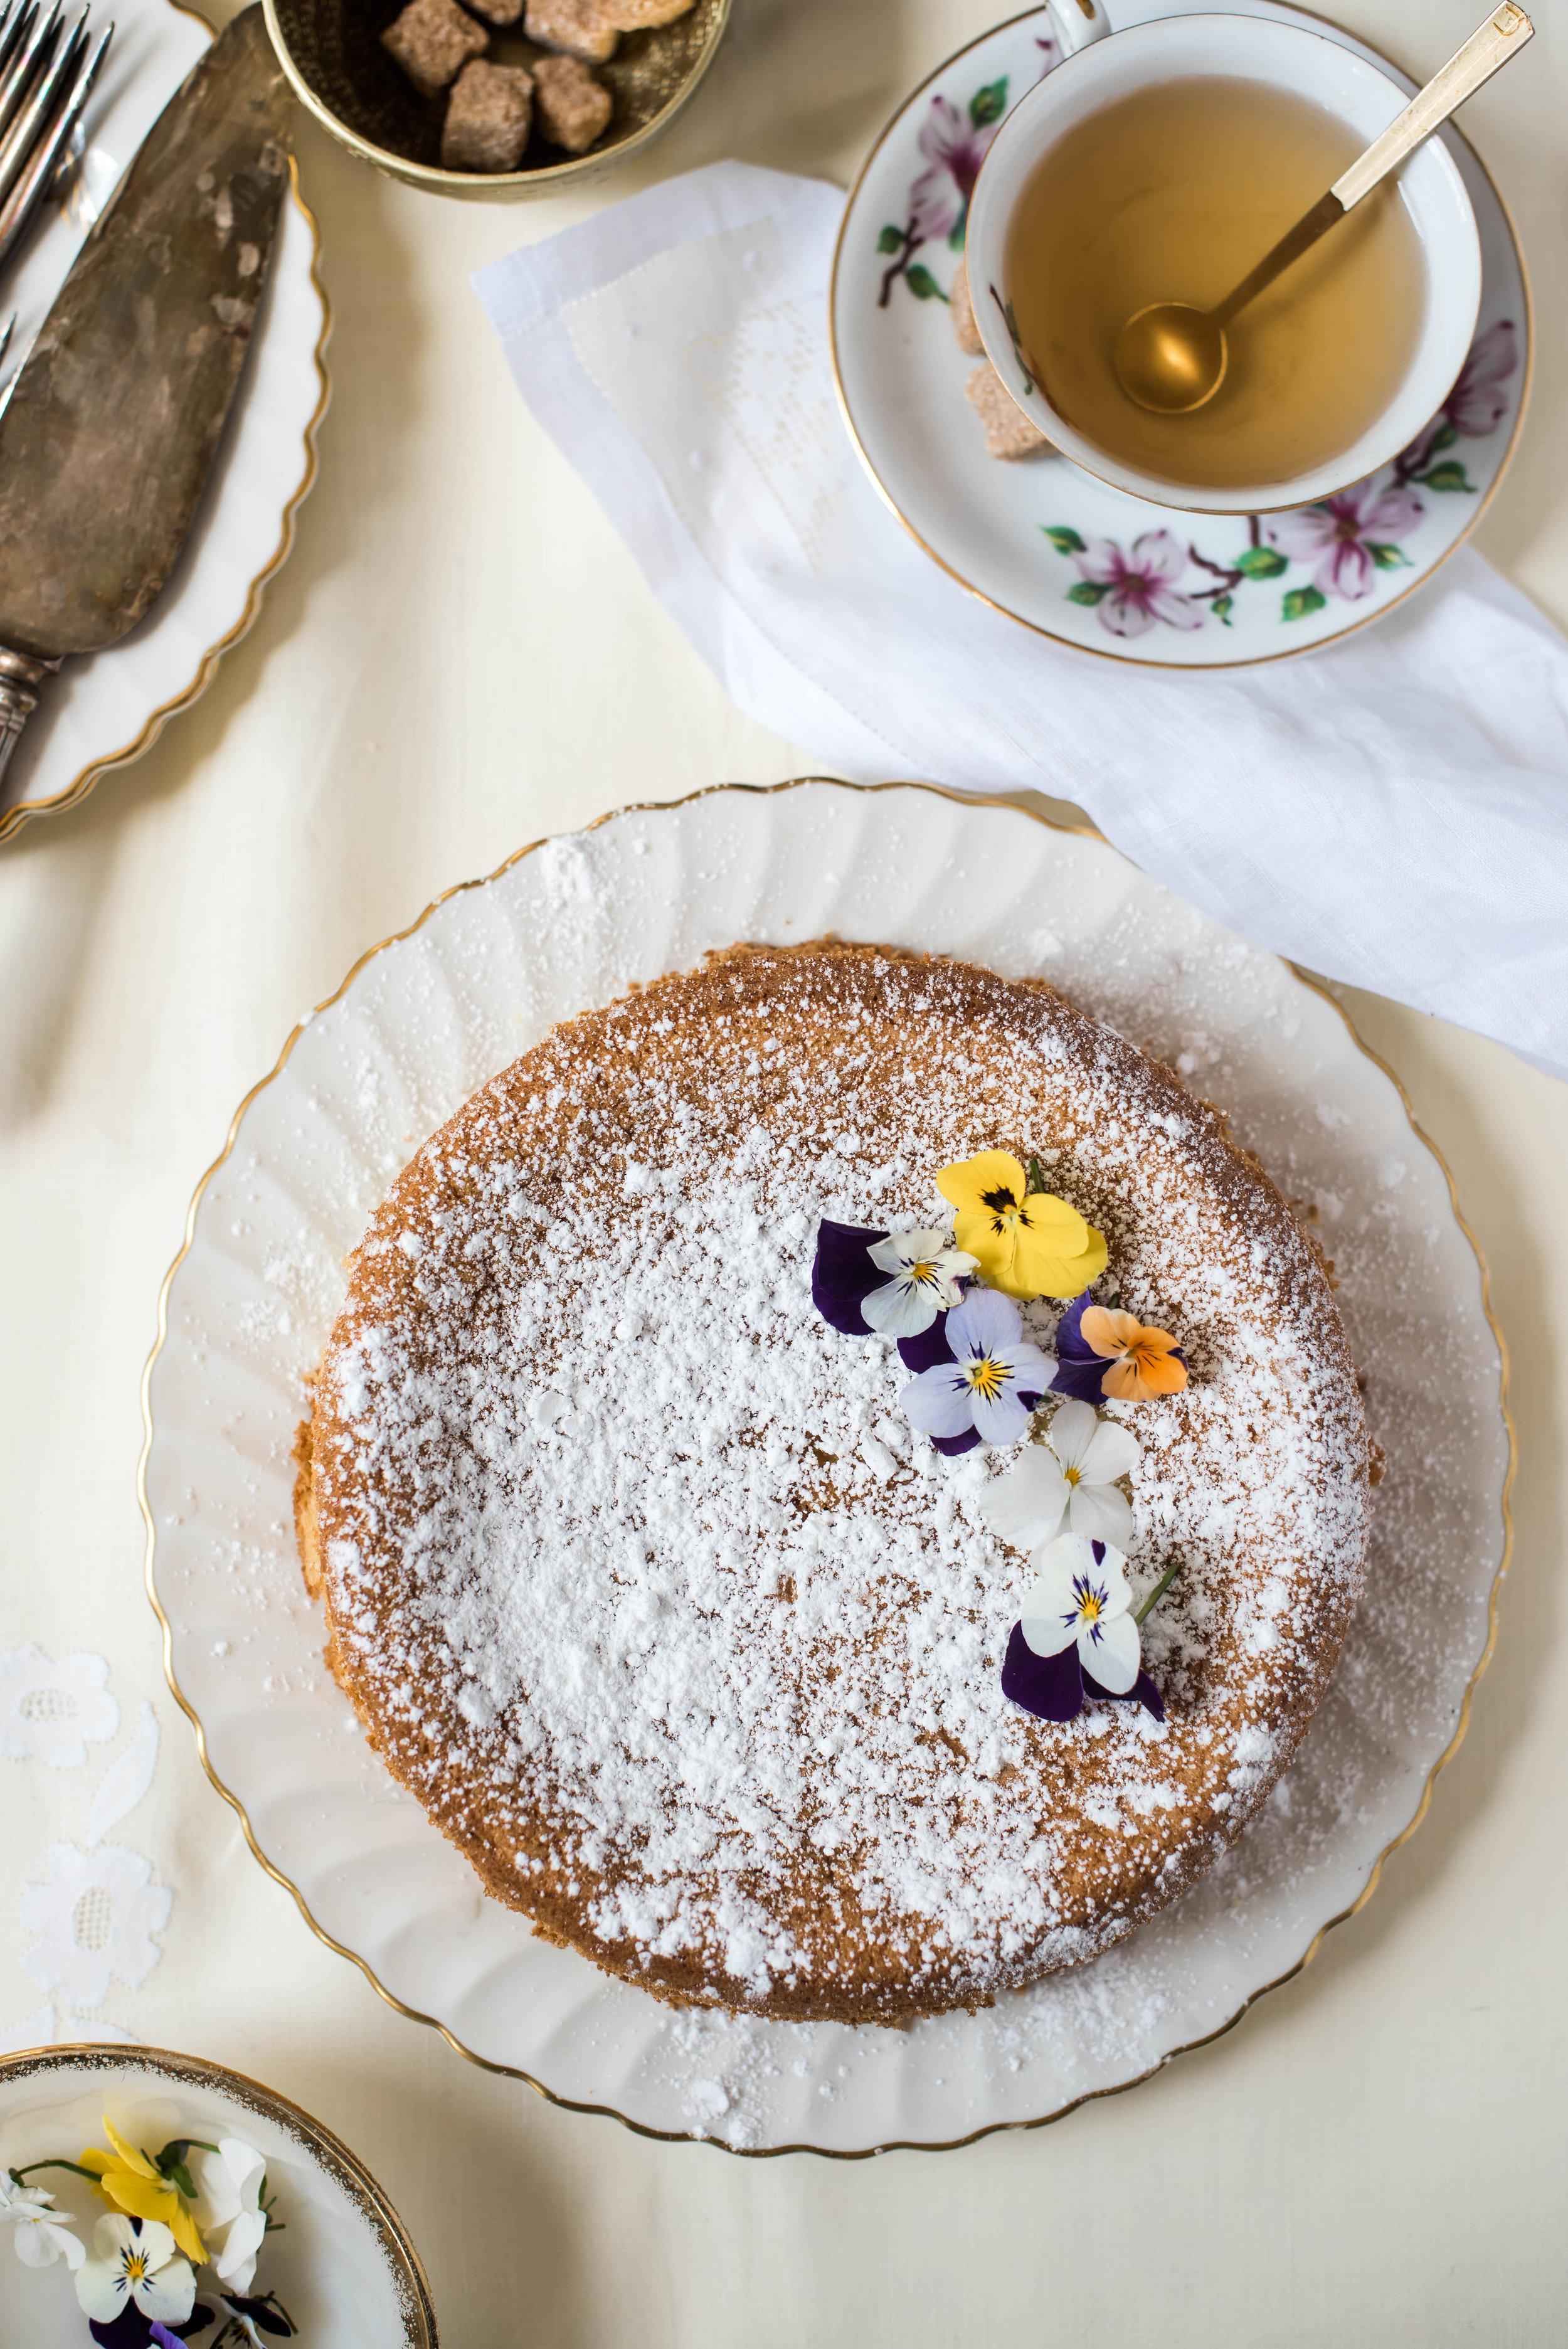 ROSE & IVY Journal Spring Celebrations Lemon Almond Cake